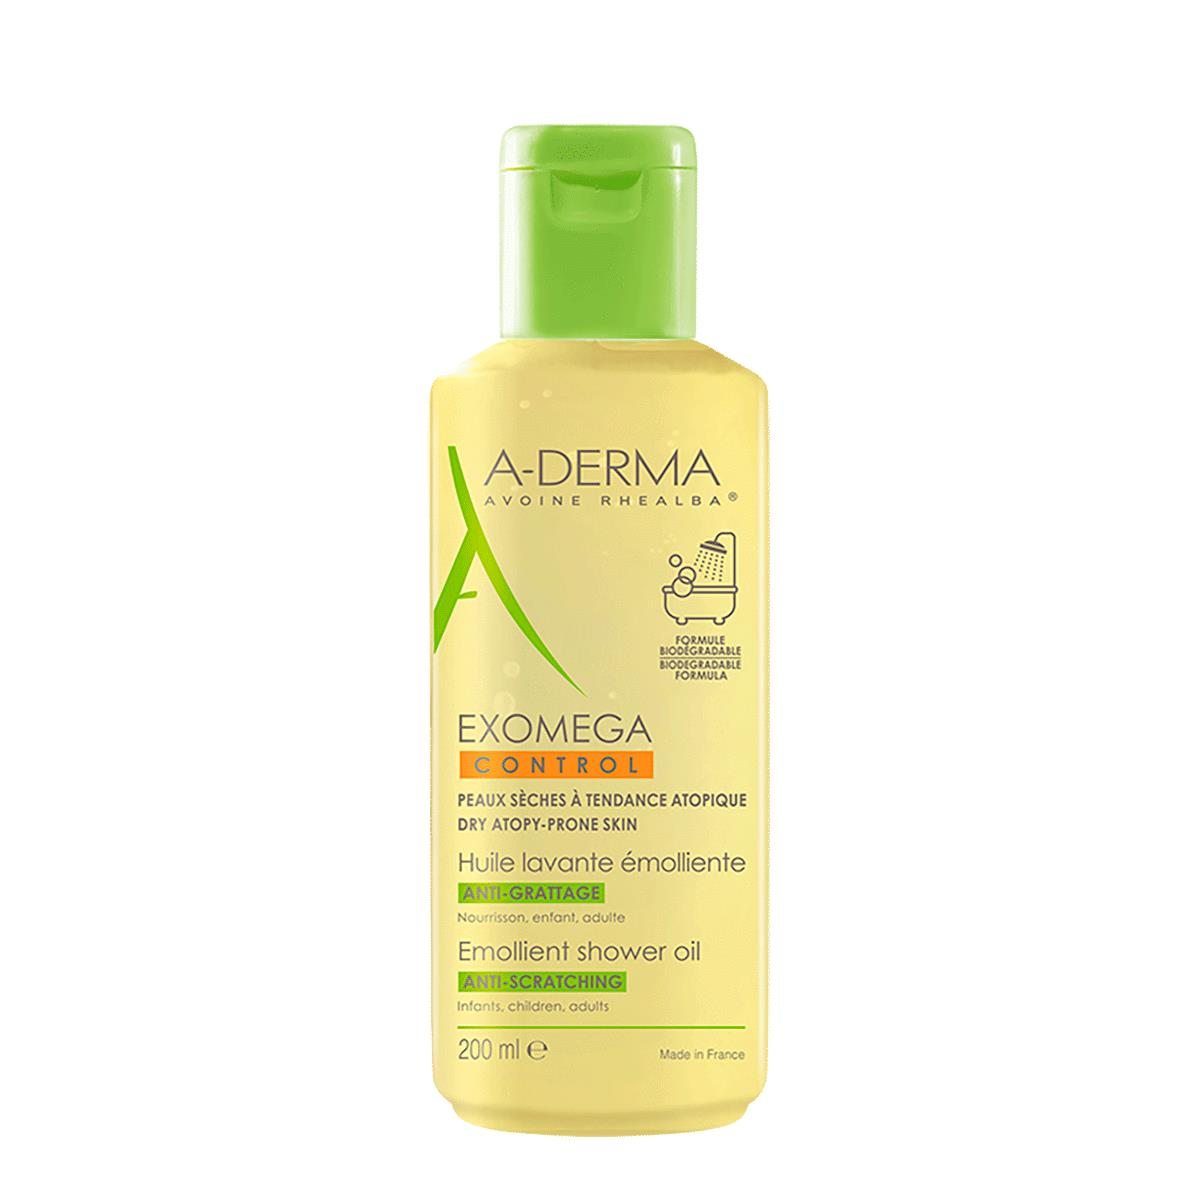 A-Derma Exomega Control Aceite Ducha 200Ml